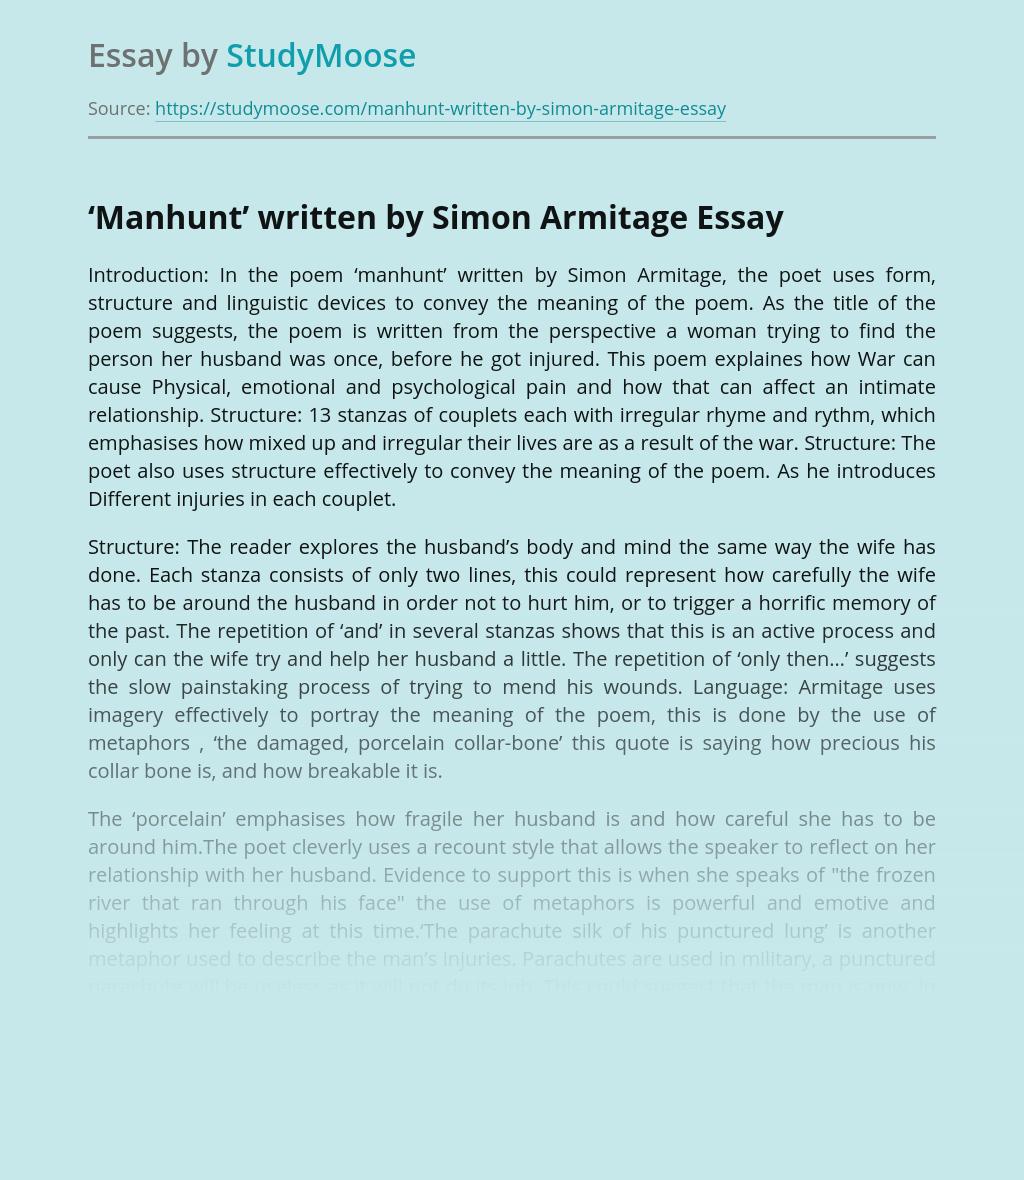 'Manhunt' written by Simon Armitage